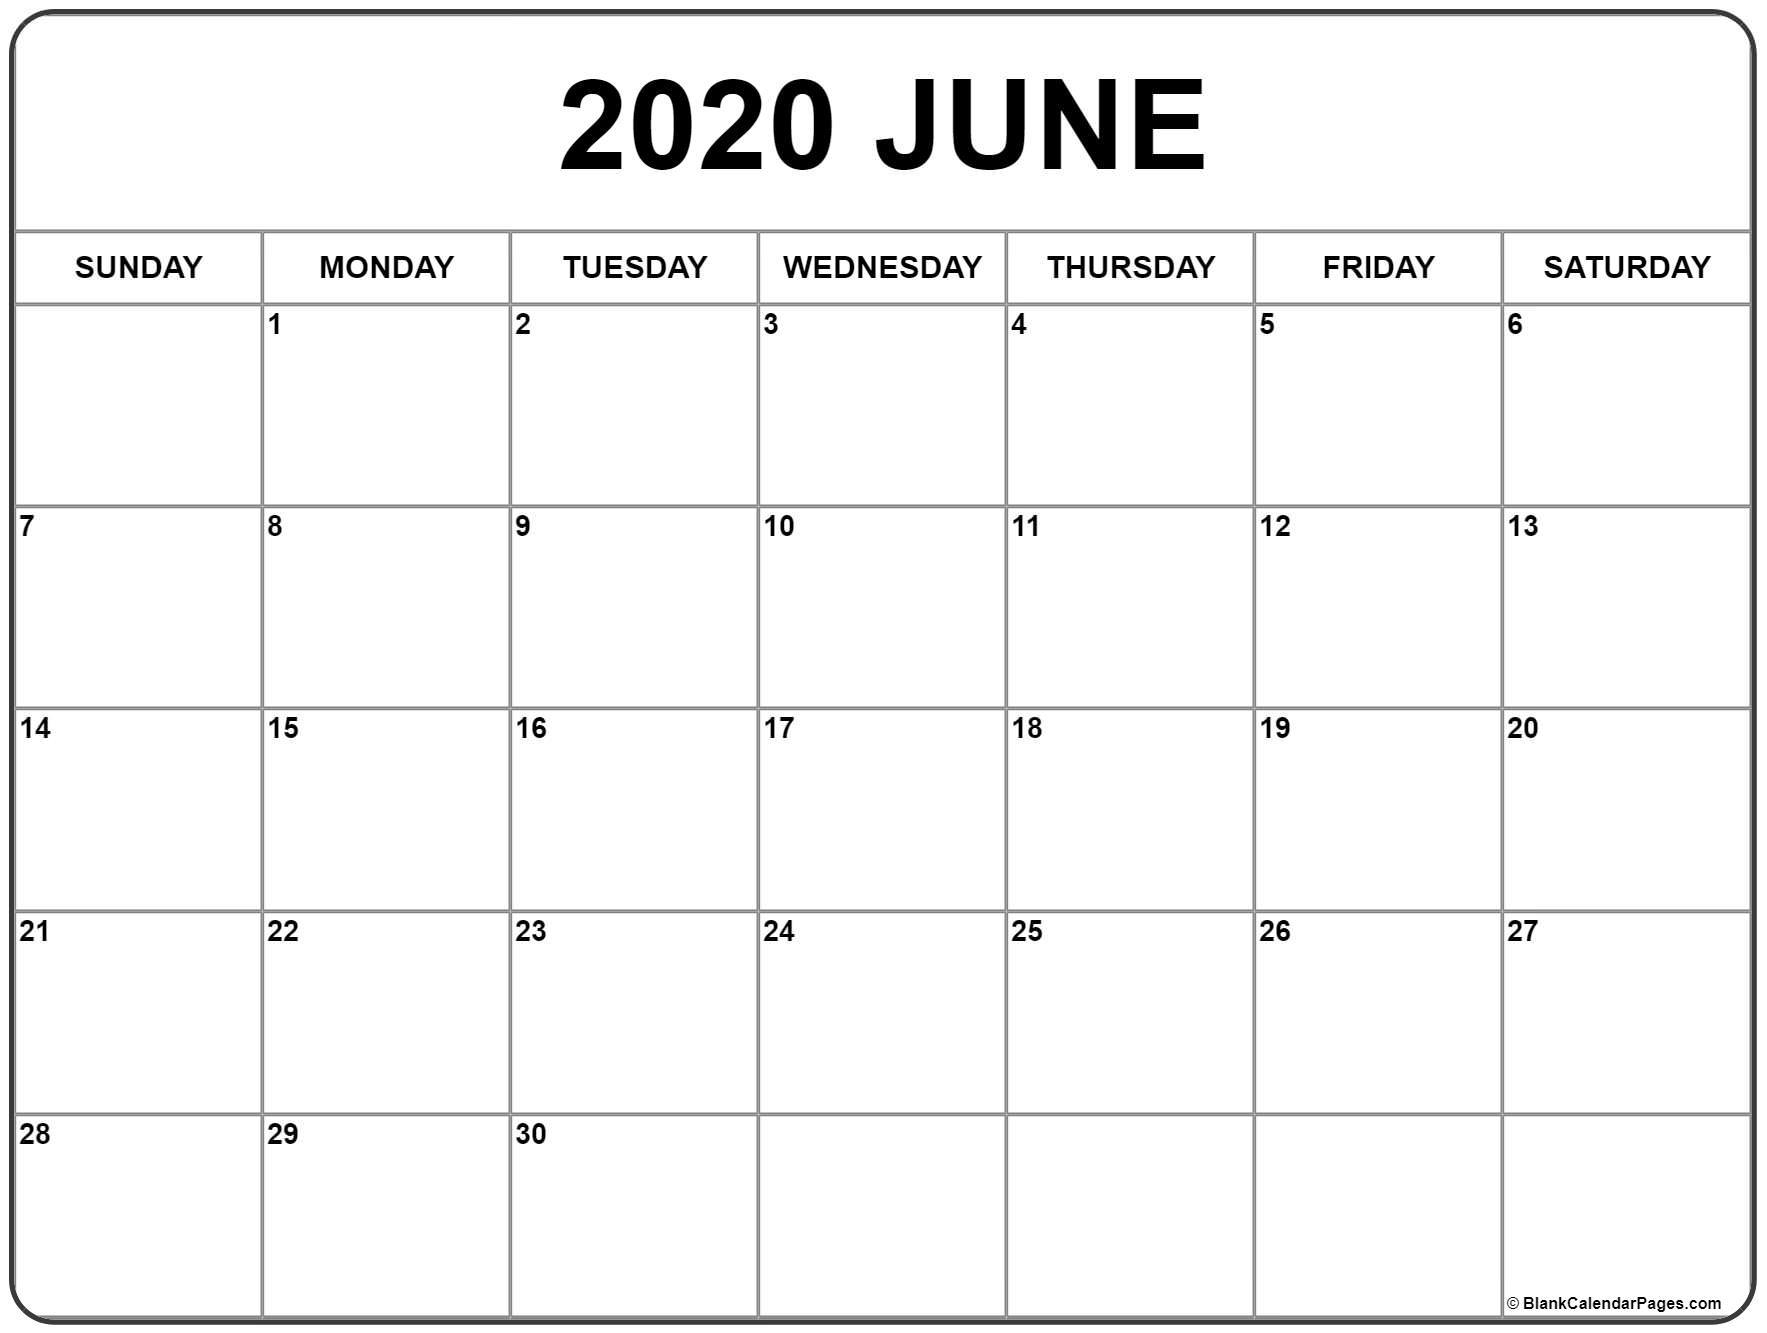 2020 June Calender - Colona.rsd7 for 2020 Liturgical Calendar June 2020